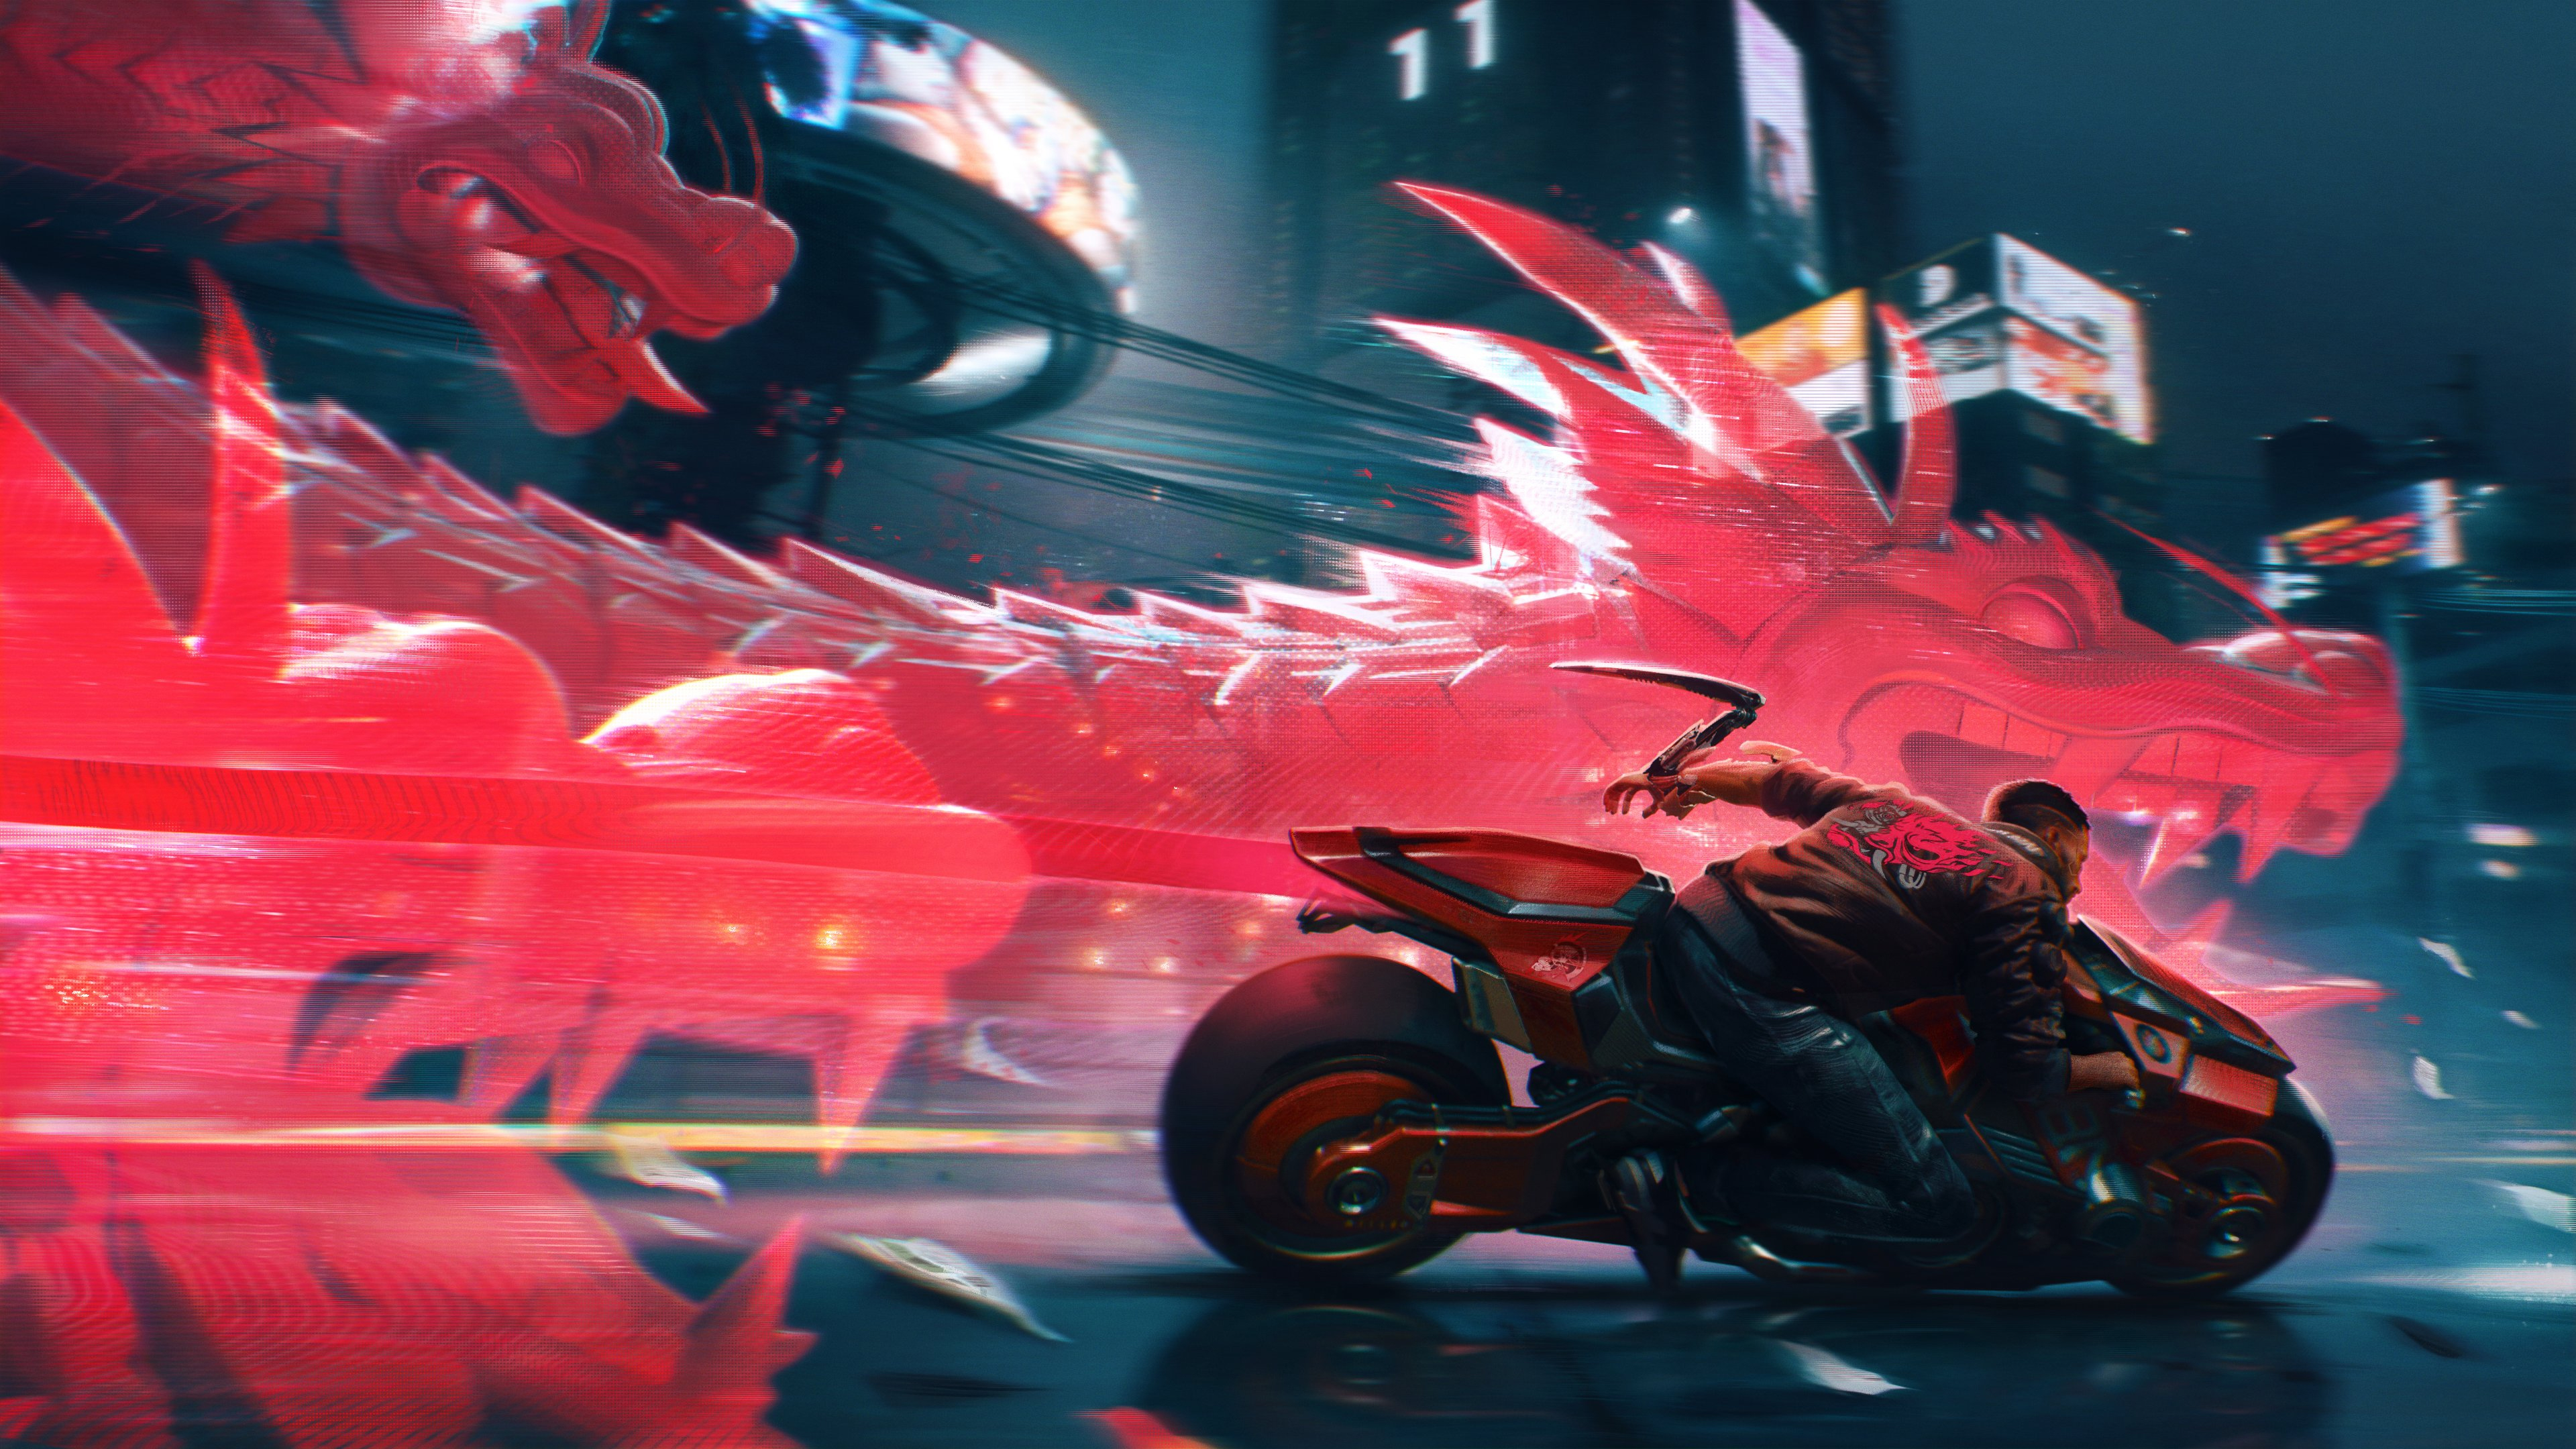 Cool Cyberpunk 2077 4K 2020 Wallpaper, HD Games 4K ...